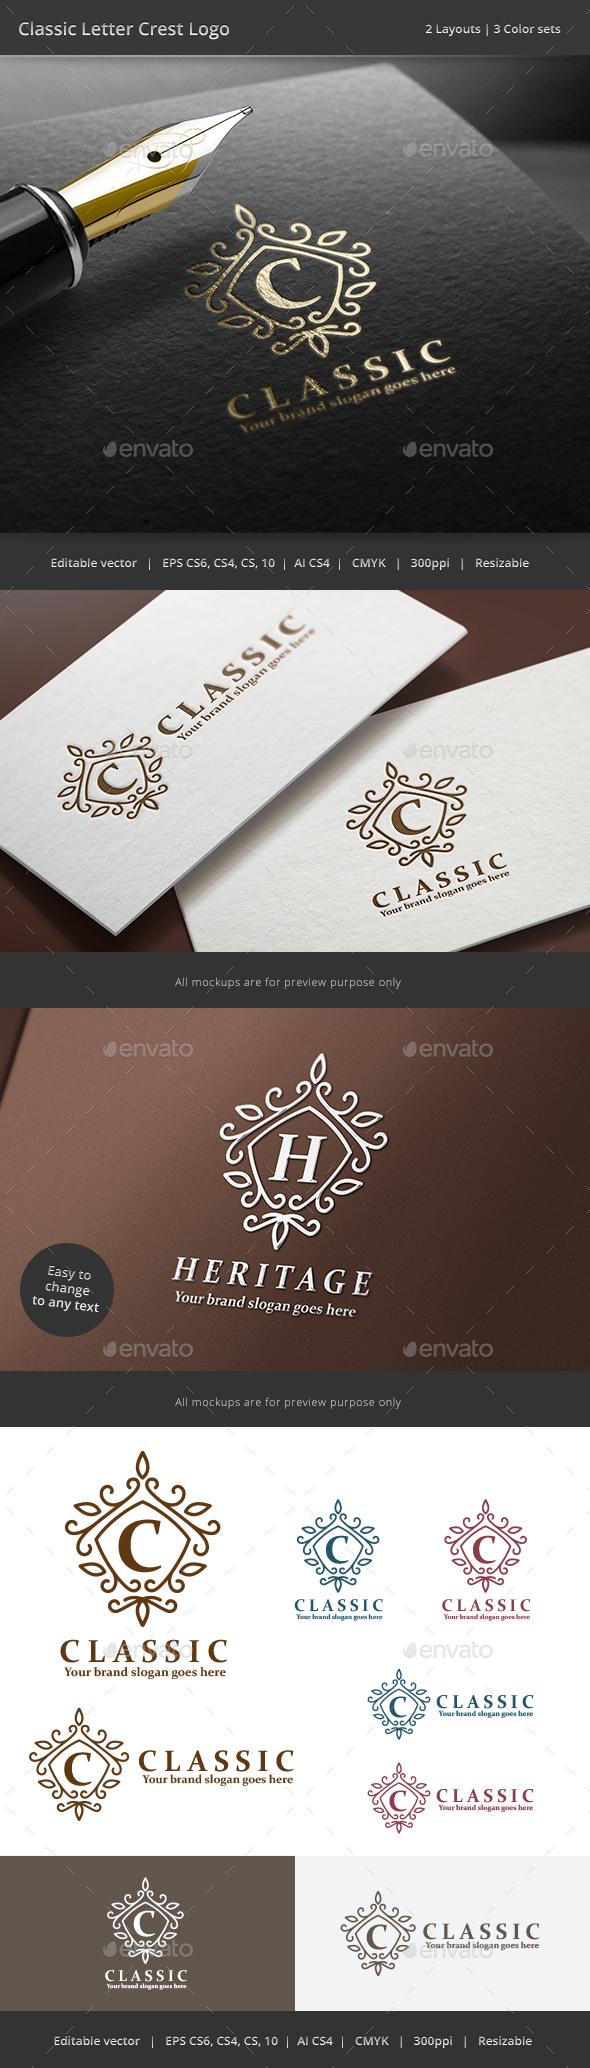 Classic Letter Crest Logo - Crests Logo Templates